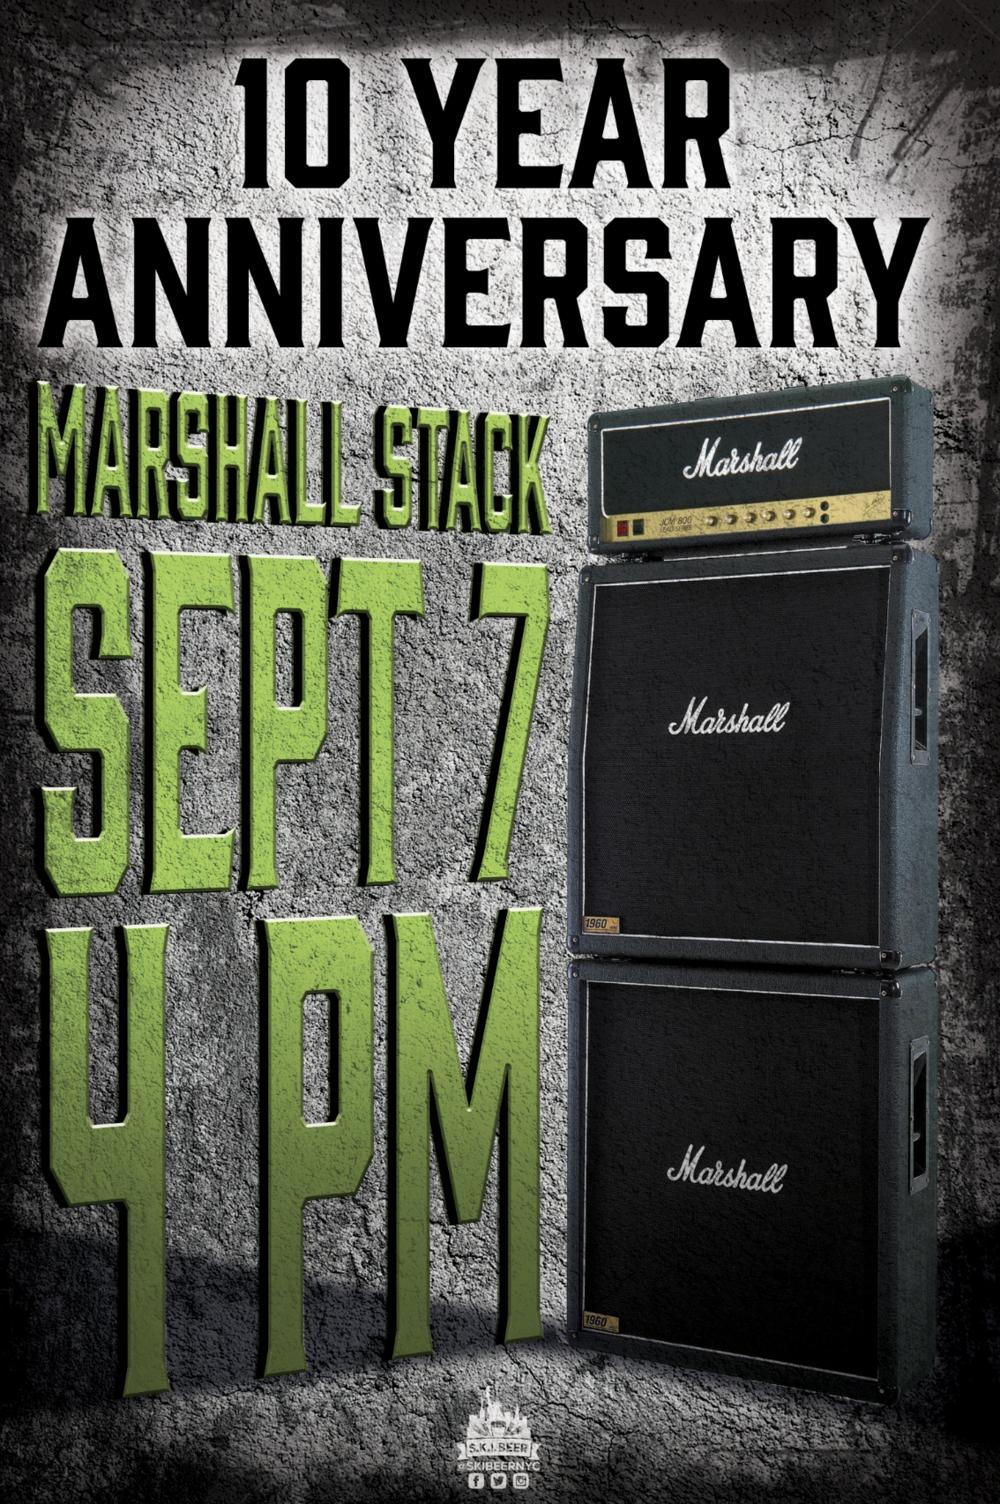 marshallstack_anniversary-web.png